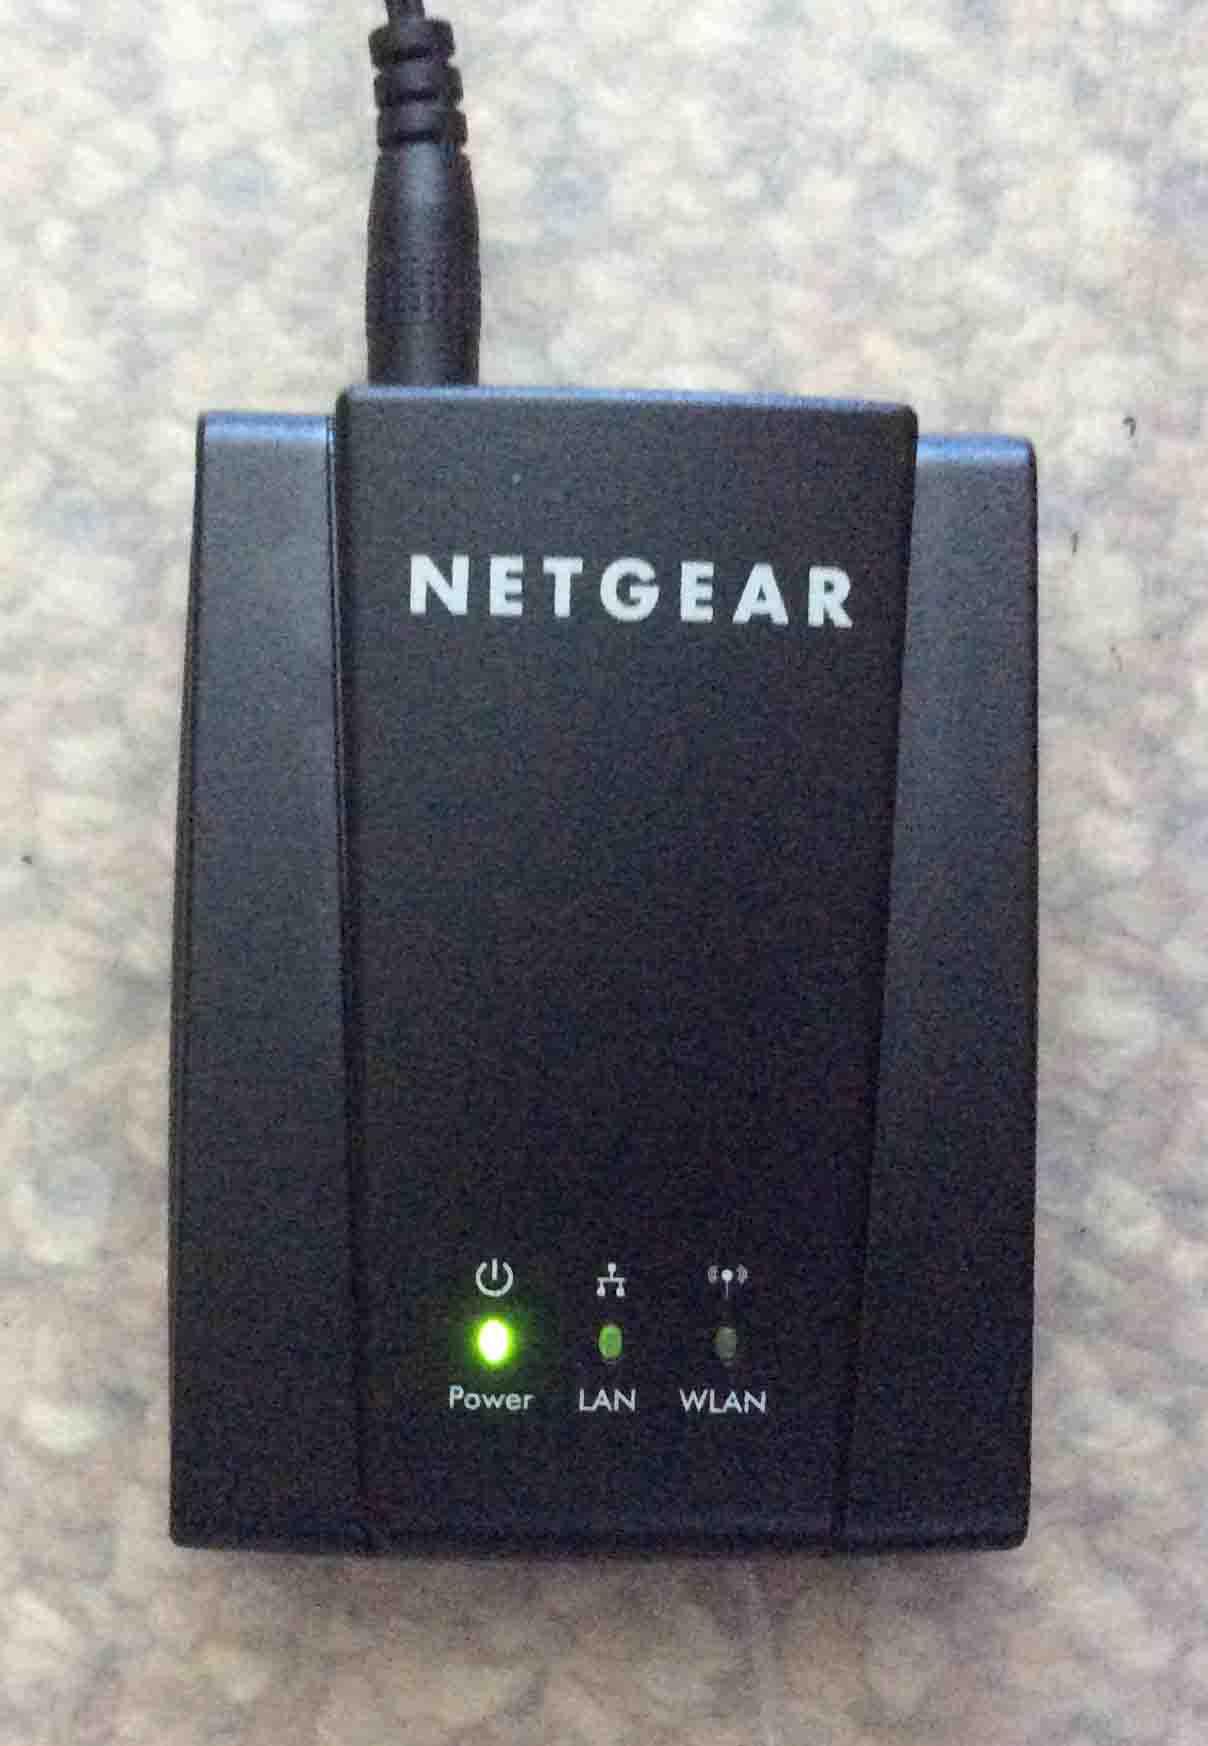 Reset WiFi Network on Netgear WNCE2001 Universal Internet Adapter ...